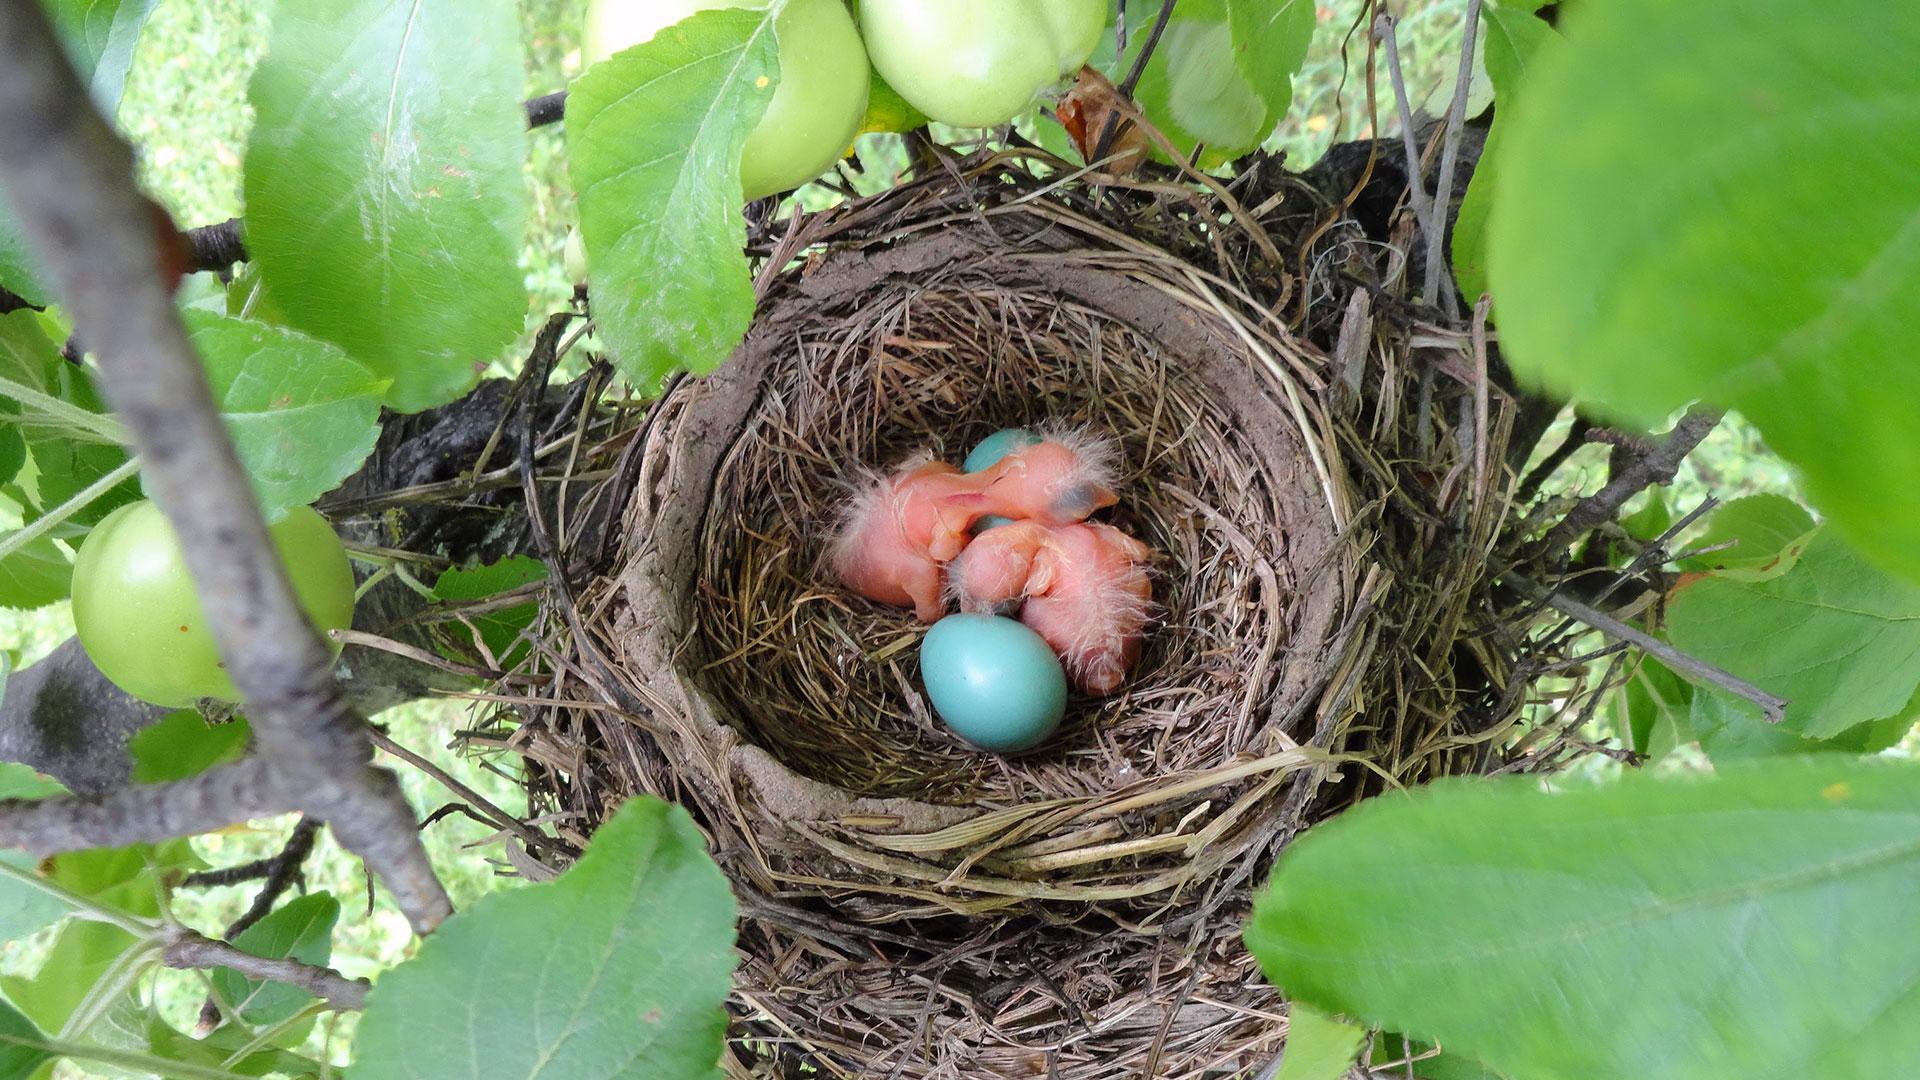 Grüne Eier im Vogelnest